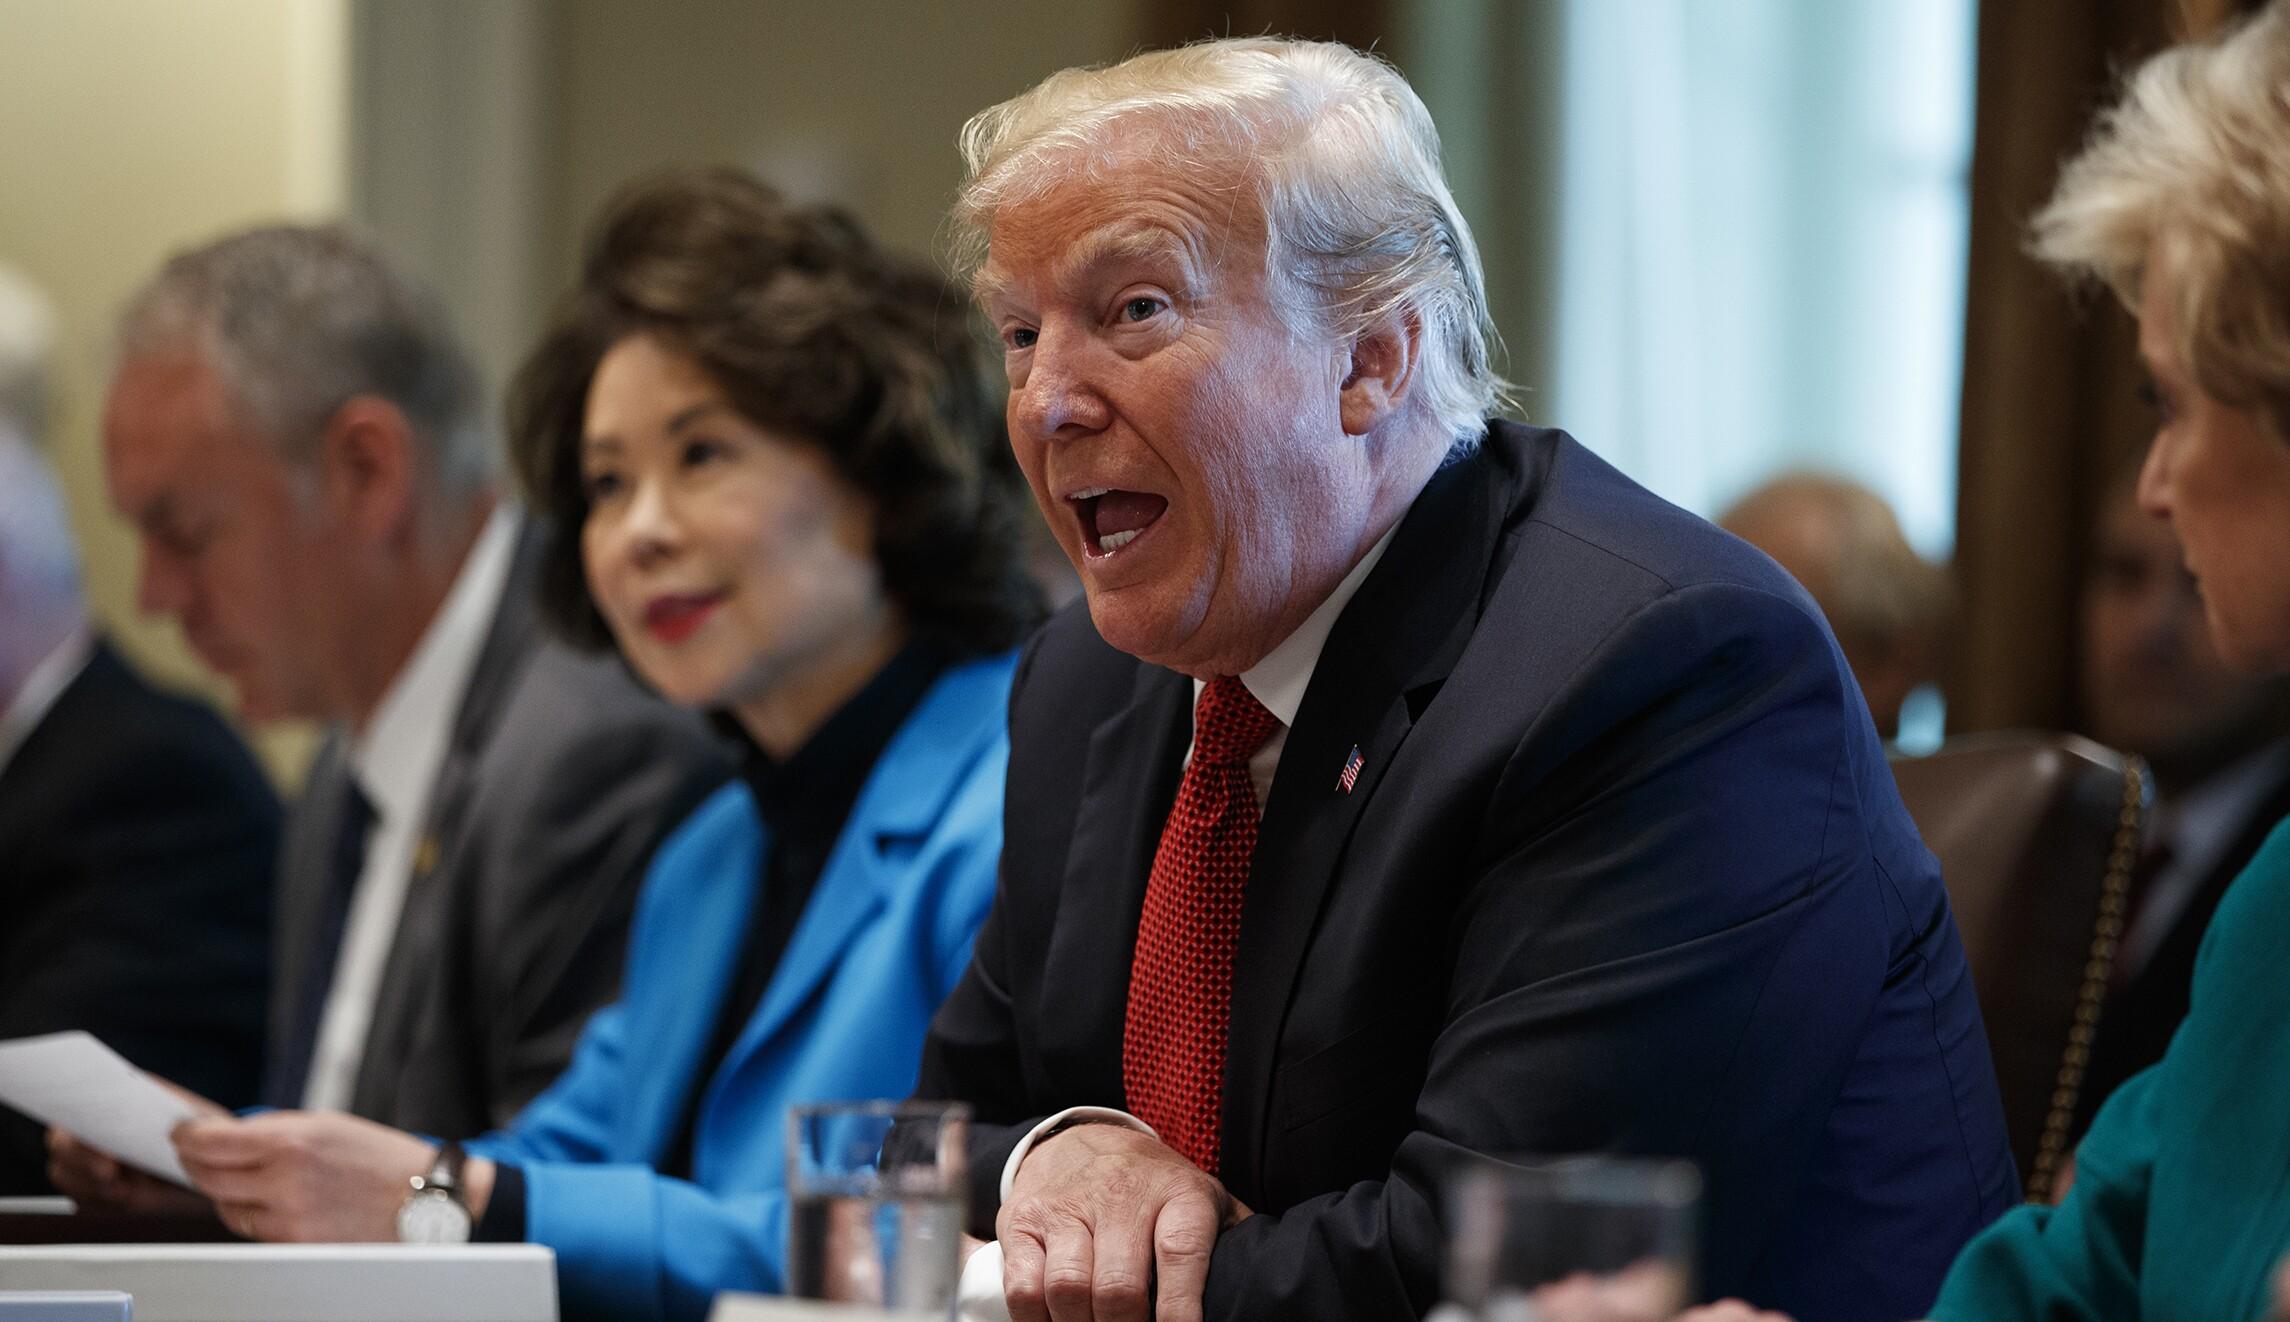 Donald Trump,Ryan Zinke,Elaine Chao,Linda McMahon